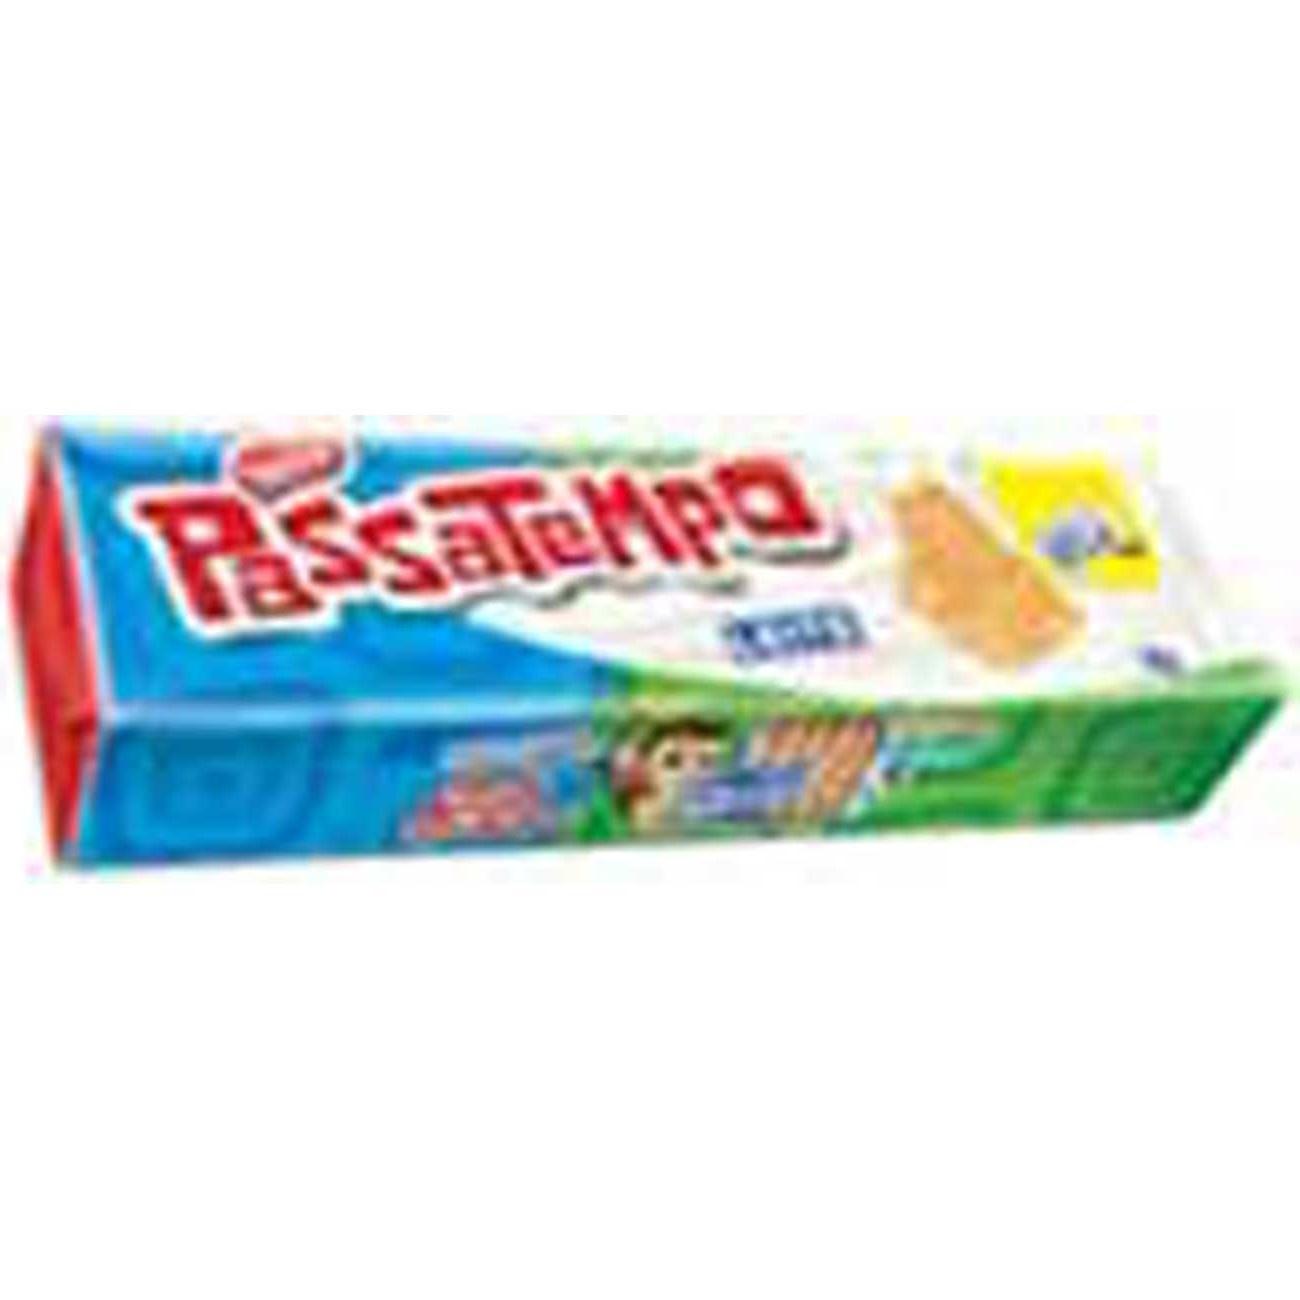 Biscoito Nestle 150G Passatempo Leite Tradicional